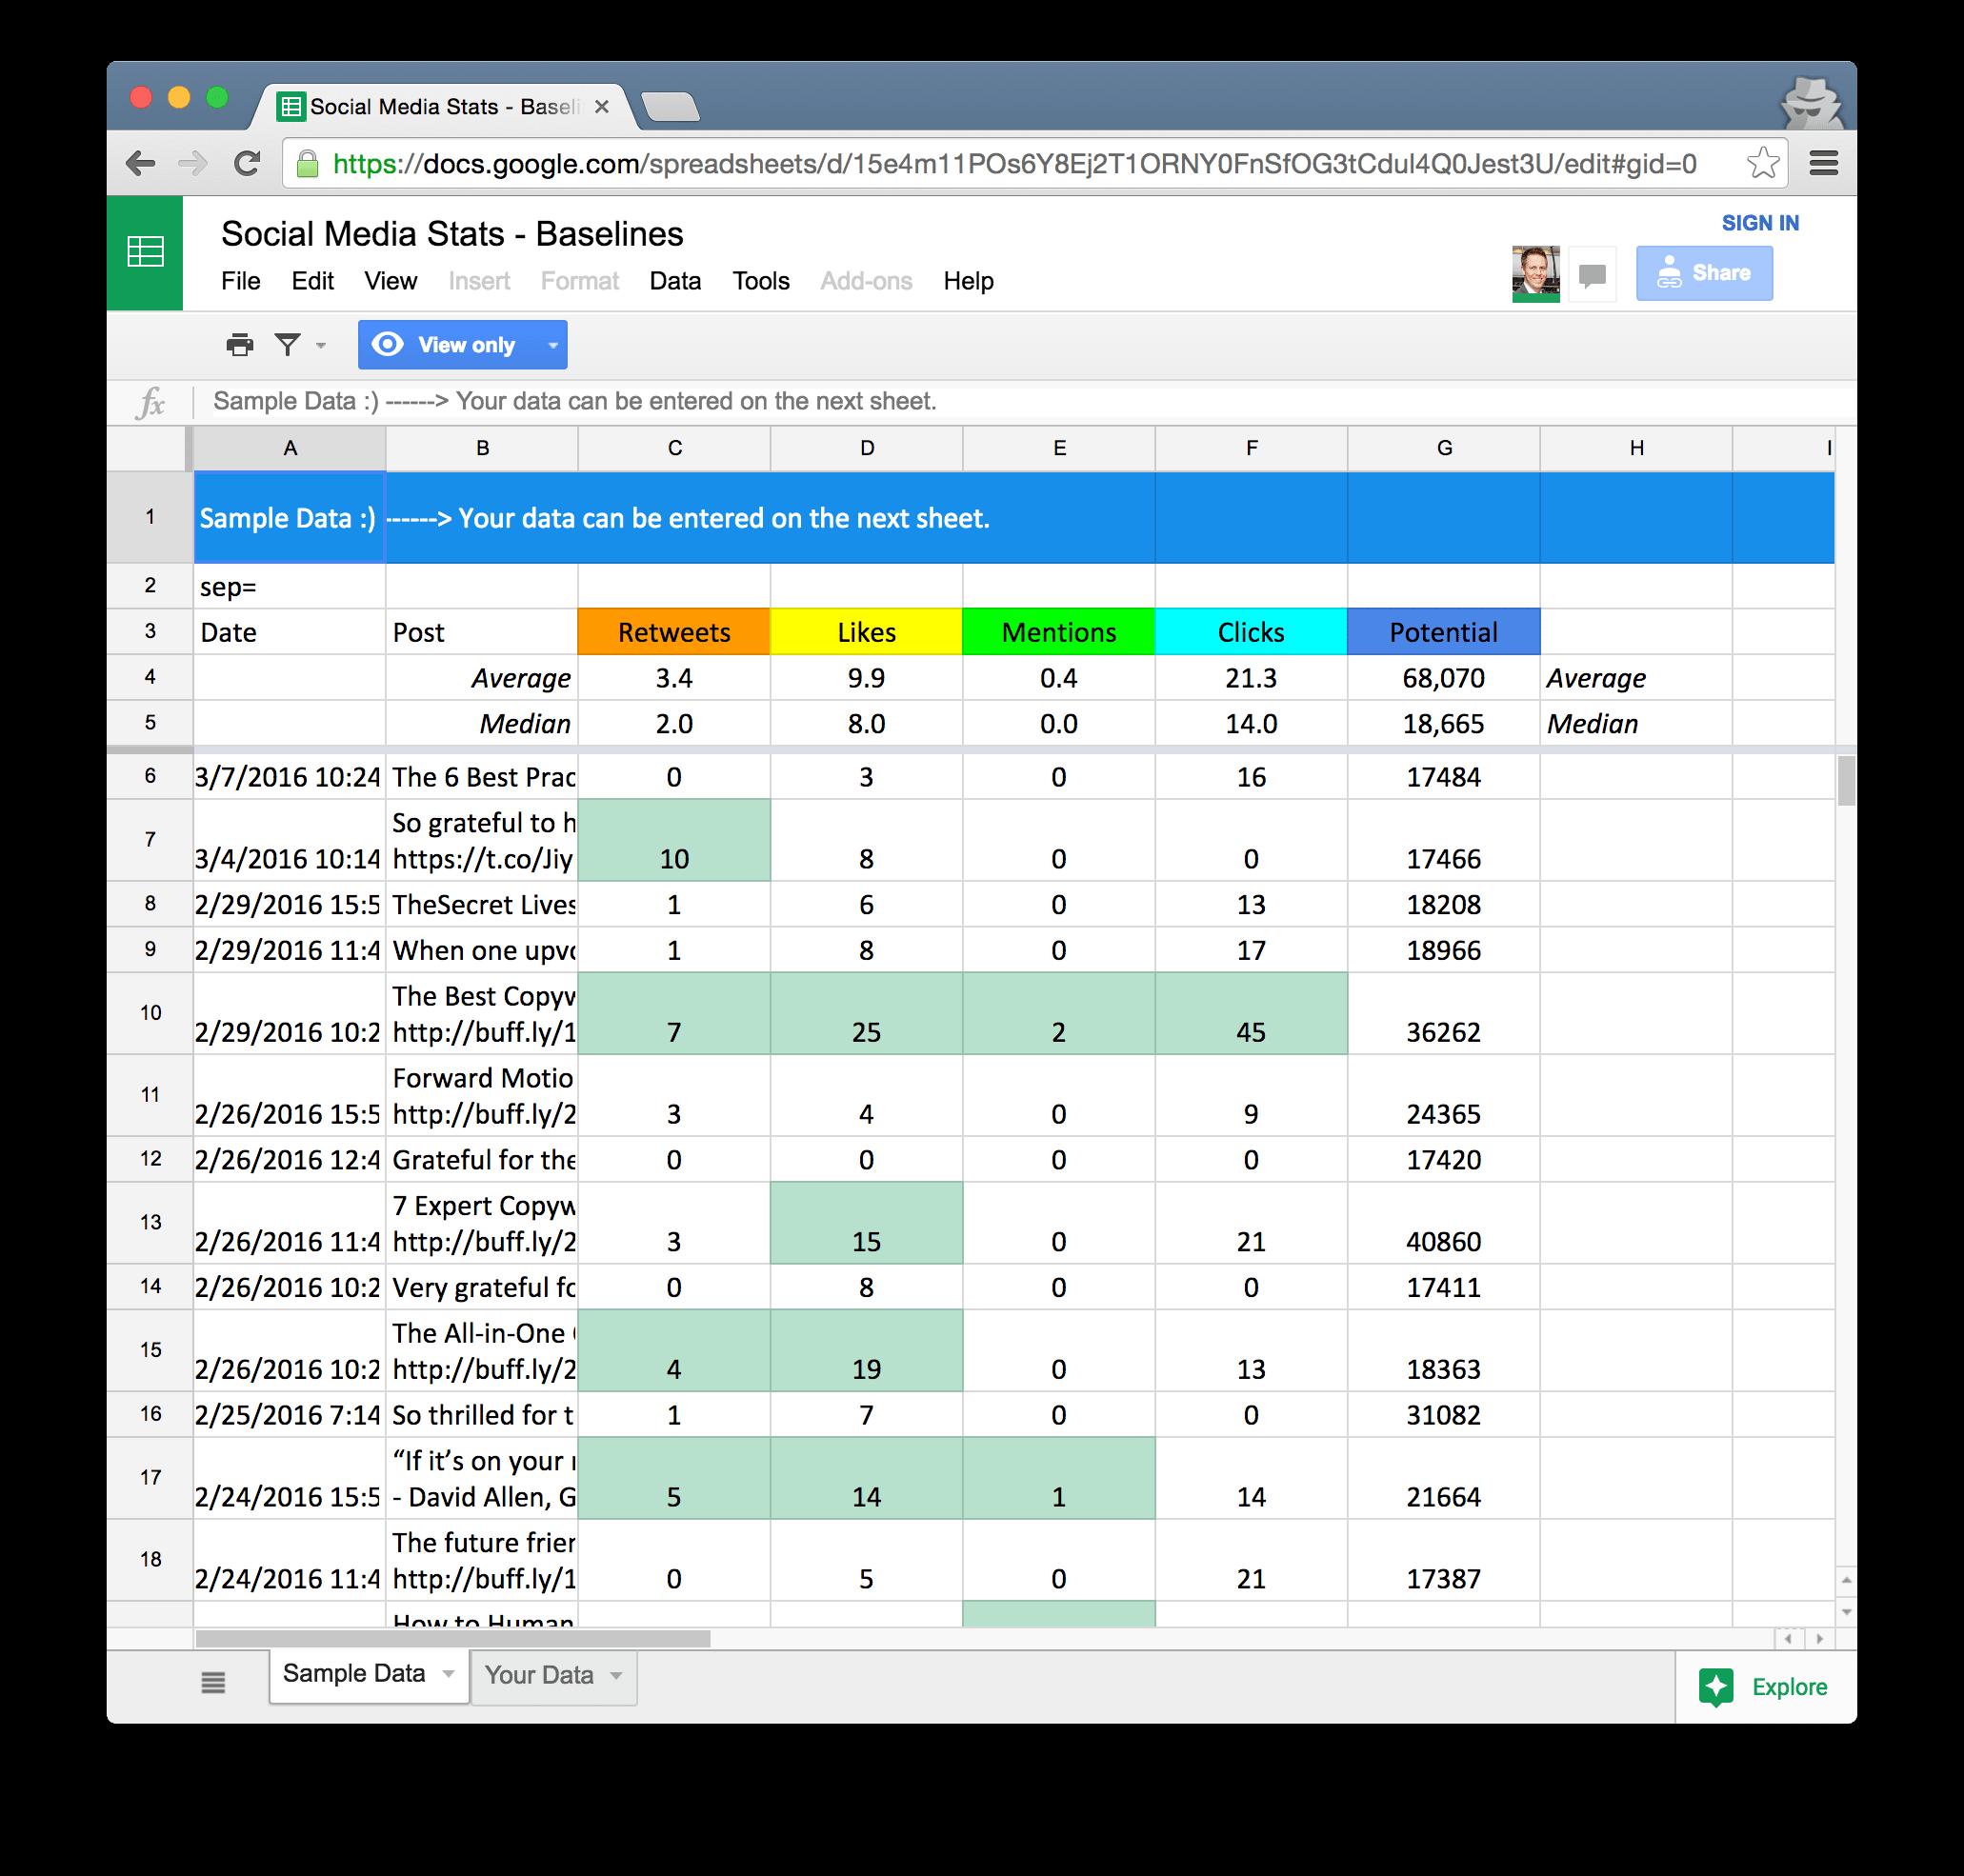 Letters Of Social Media Analytics Excel Template Inside Social Media Analytics Excel Template For Google Spreadsheet